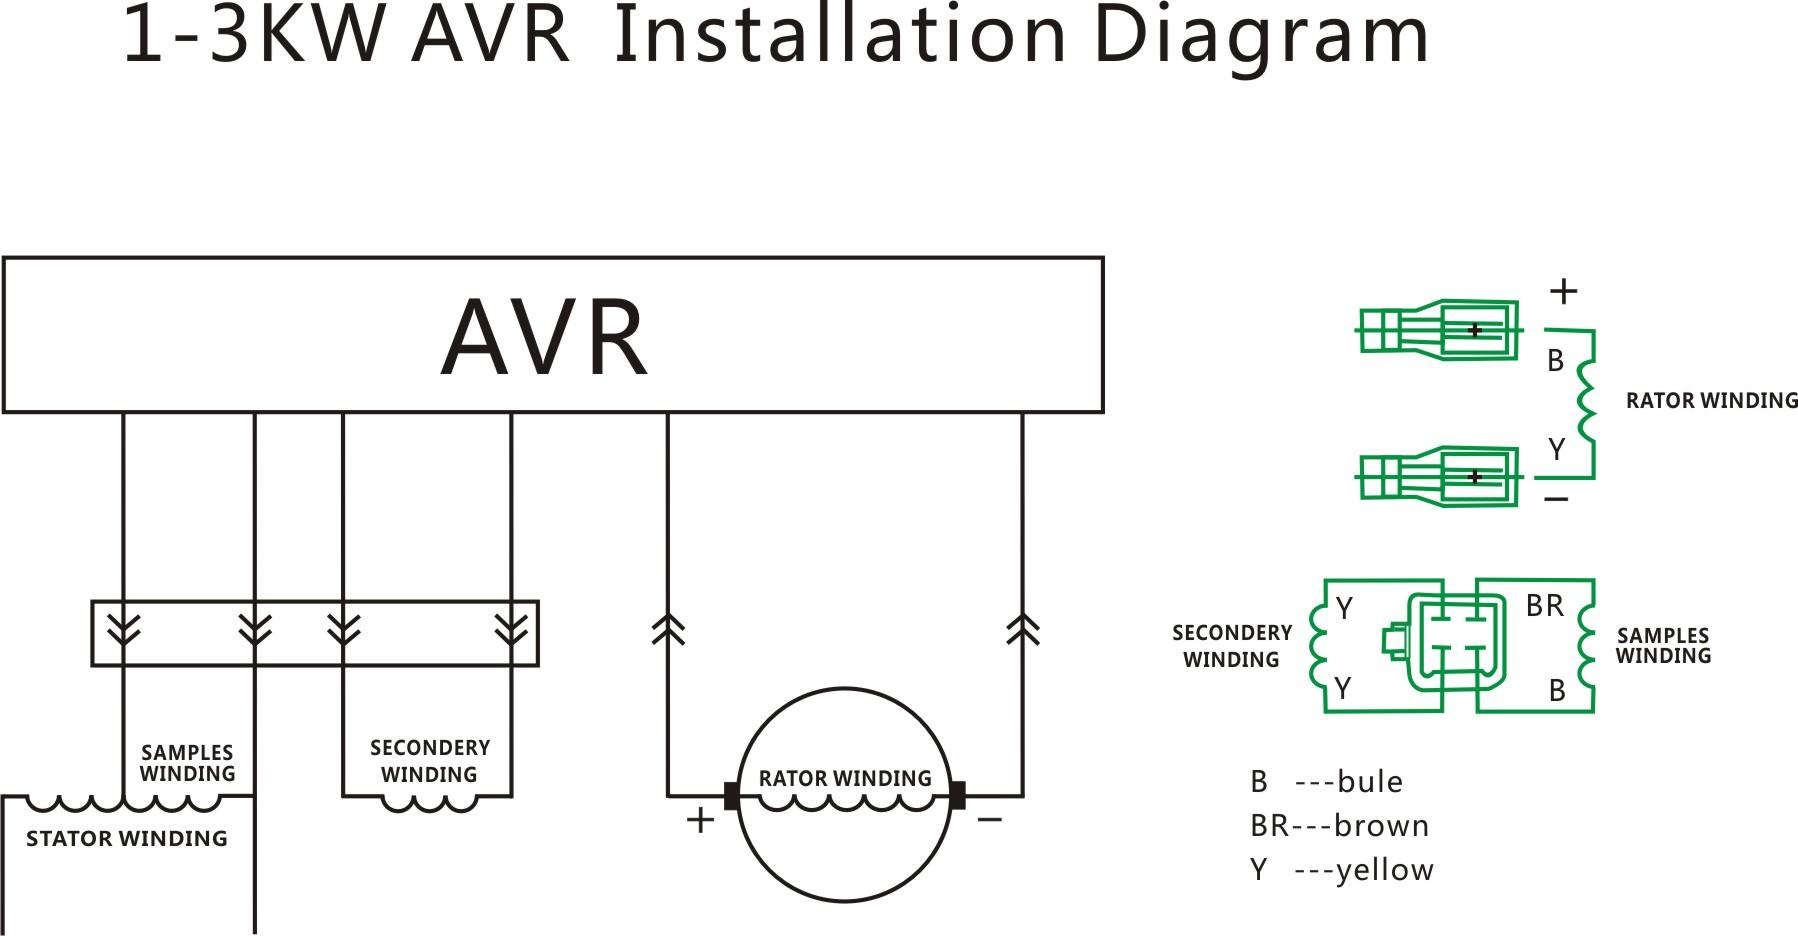 Circuit diagram of generator avr free download wiring diagram free download wiring diagram how to replacing portable generator avr china generator avr of circuit asfbconference2016 Choice Image